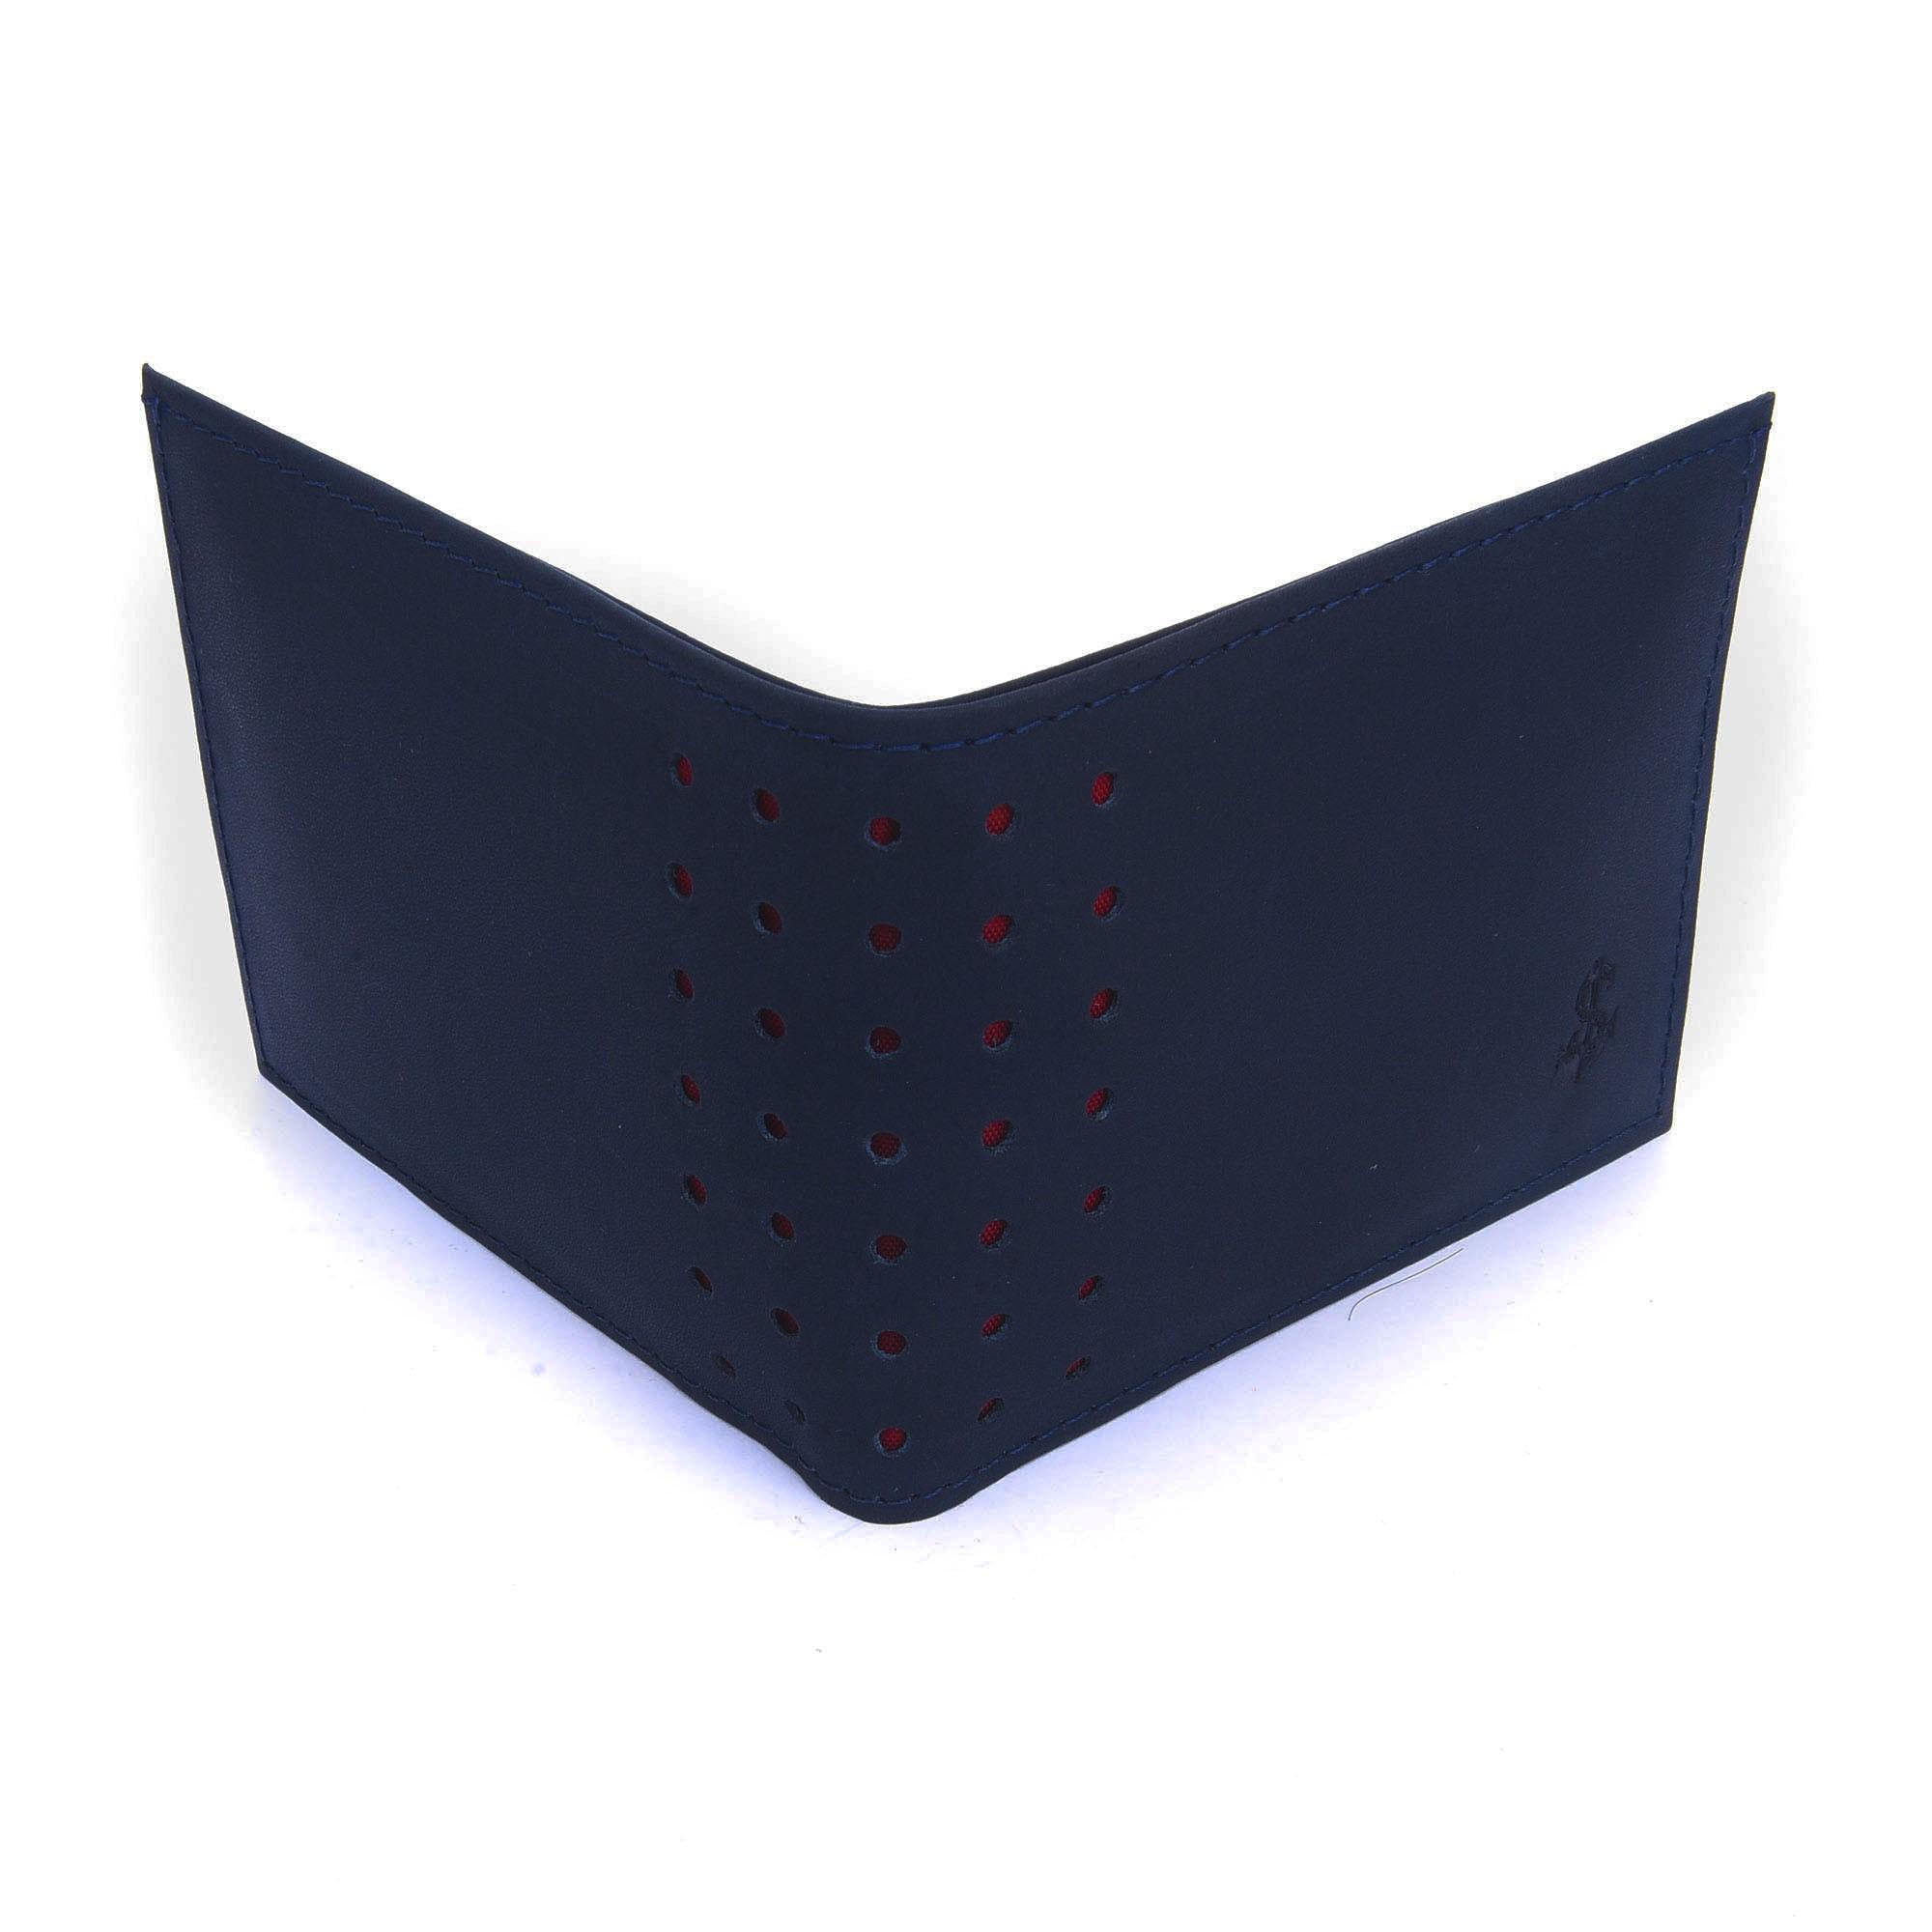 Carteira Classic De Couro Legítimo Azul  - Style Empório